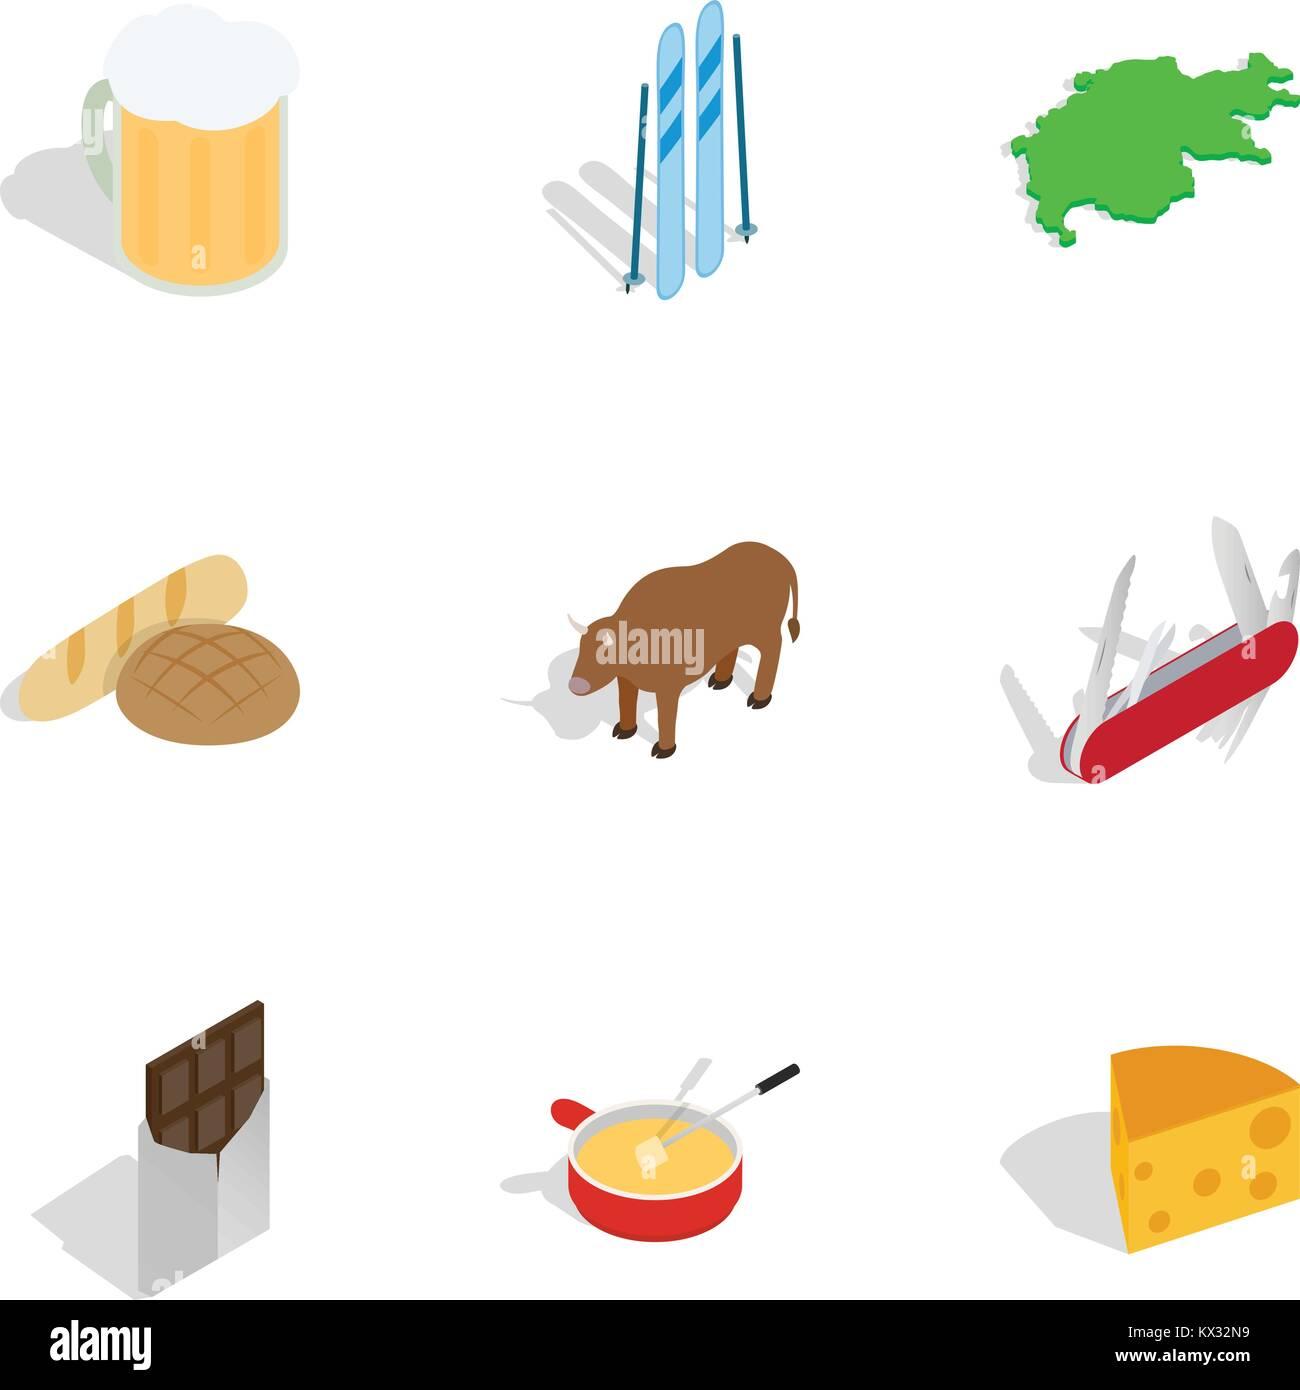 Symbols Of Switzerland Icons Set Stock Vector Art Illustration